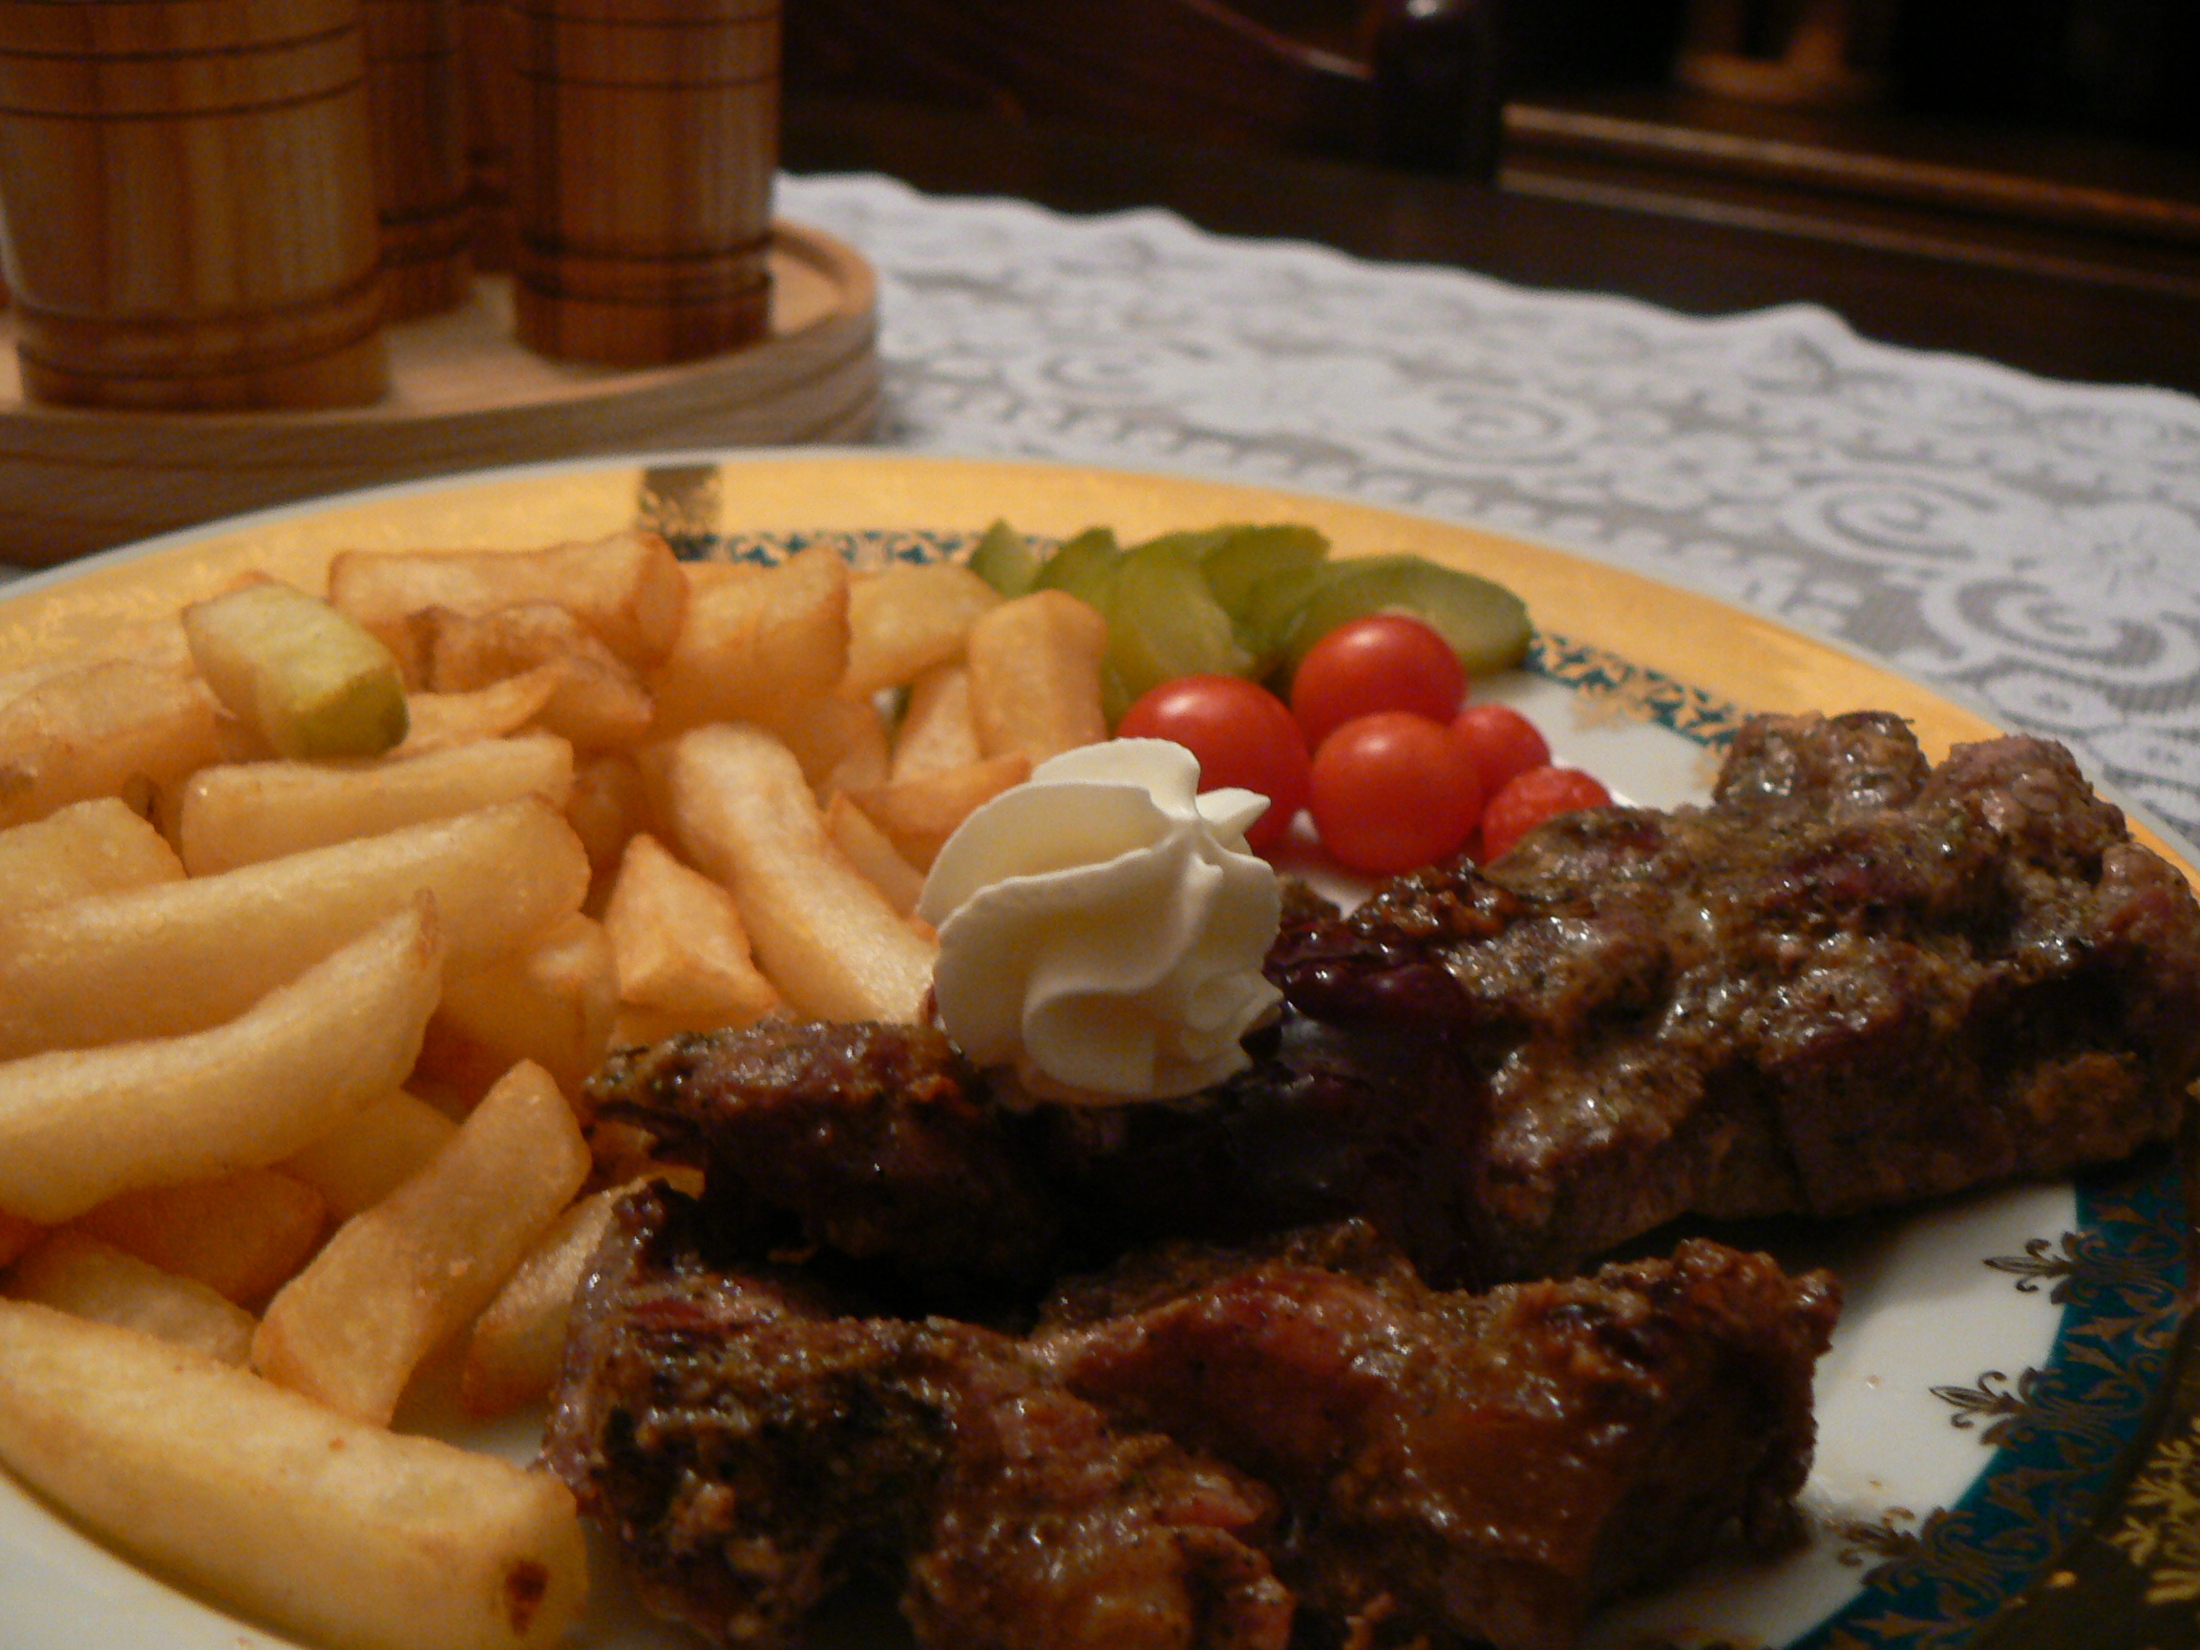 Divoký kančí steak